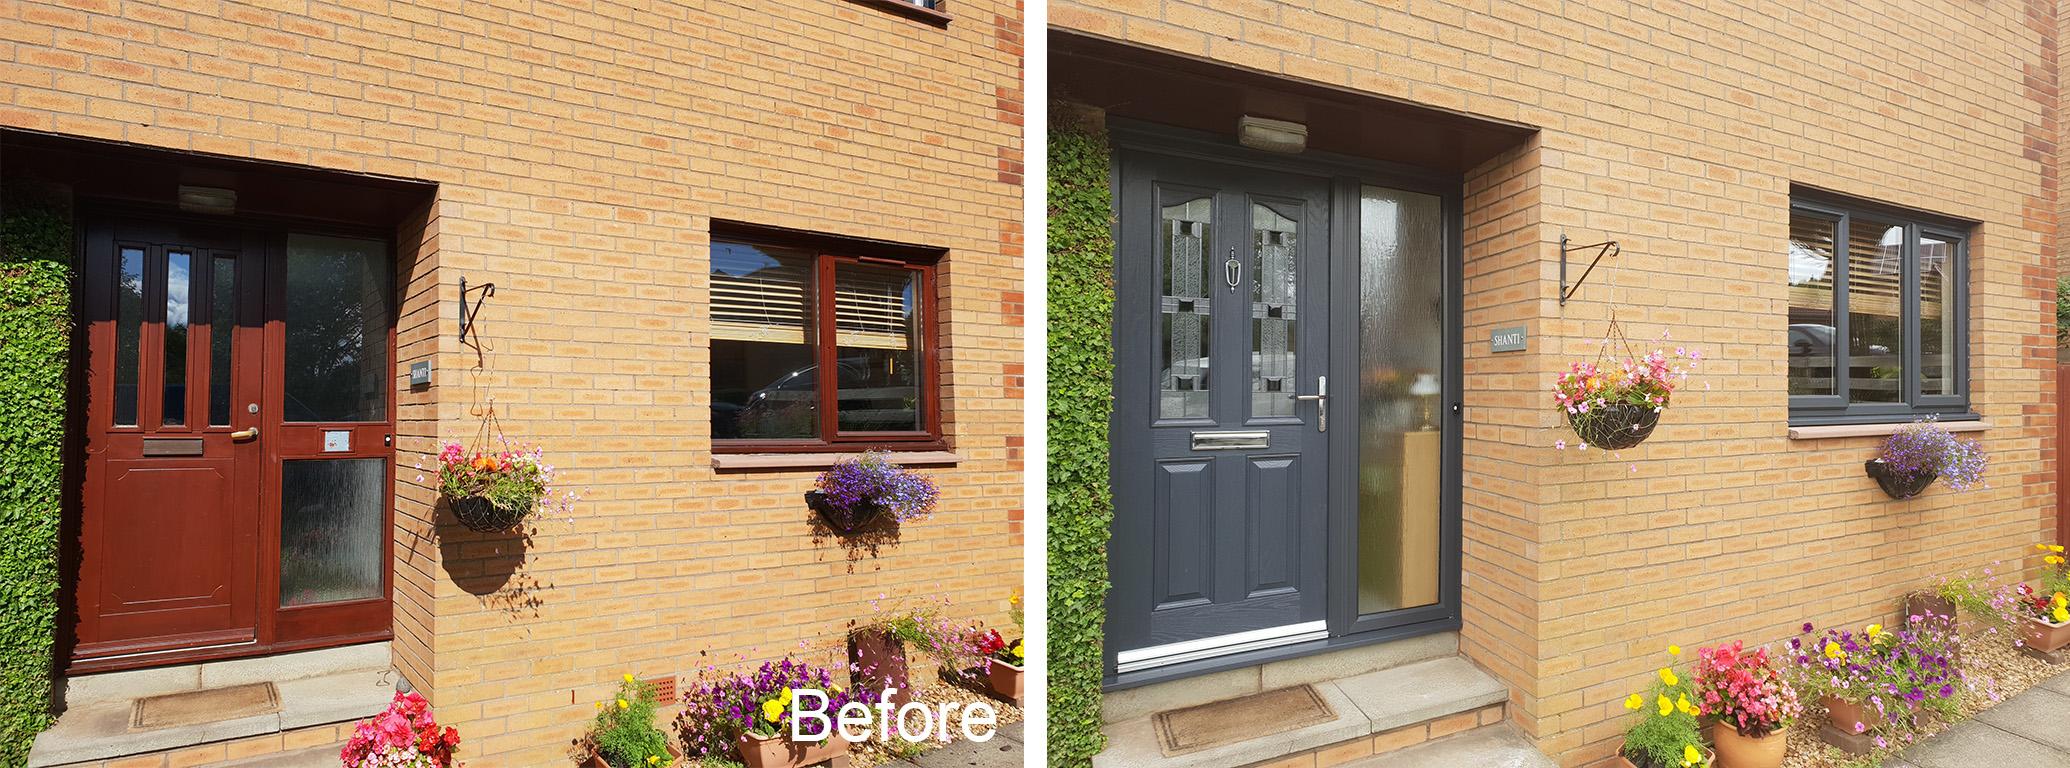 New uPVC windows doors East Kilbride